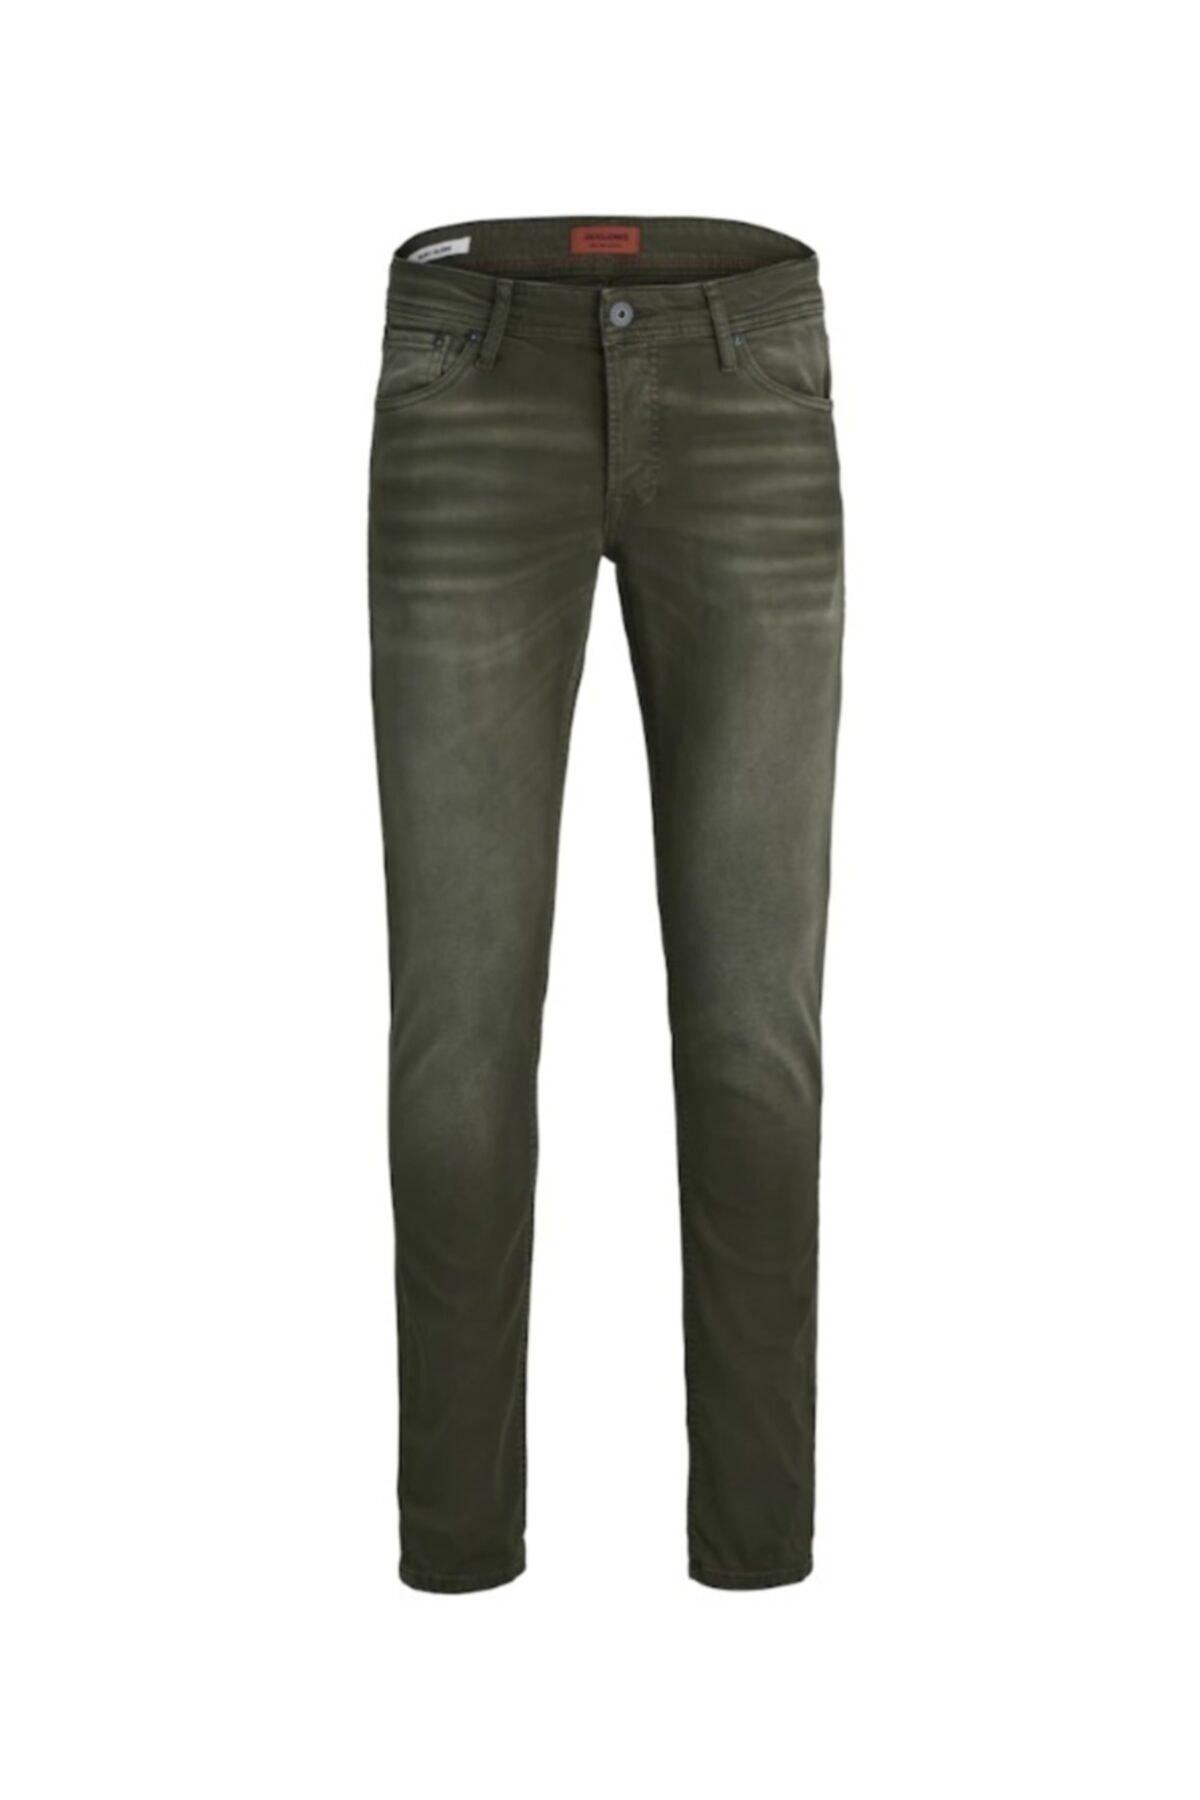 Jack & Jones Jack Jones Erkek Glenn Model Haki Renk Kot Pantolon 12163928 1